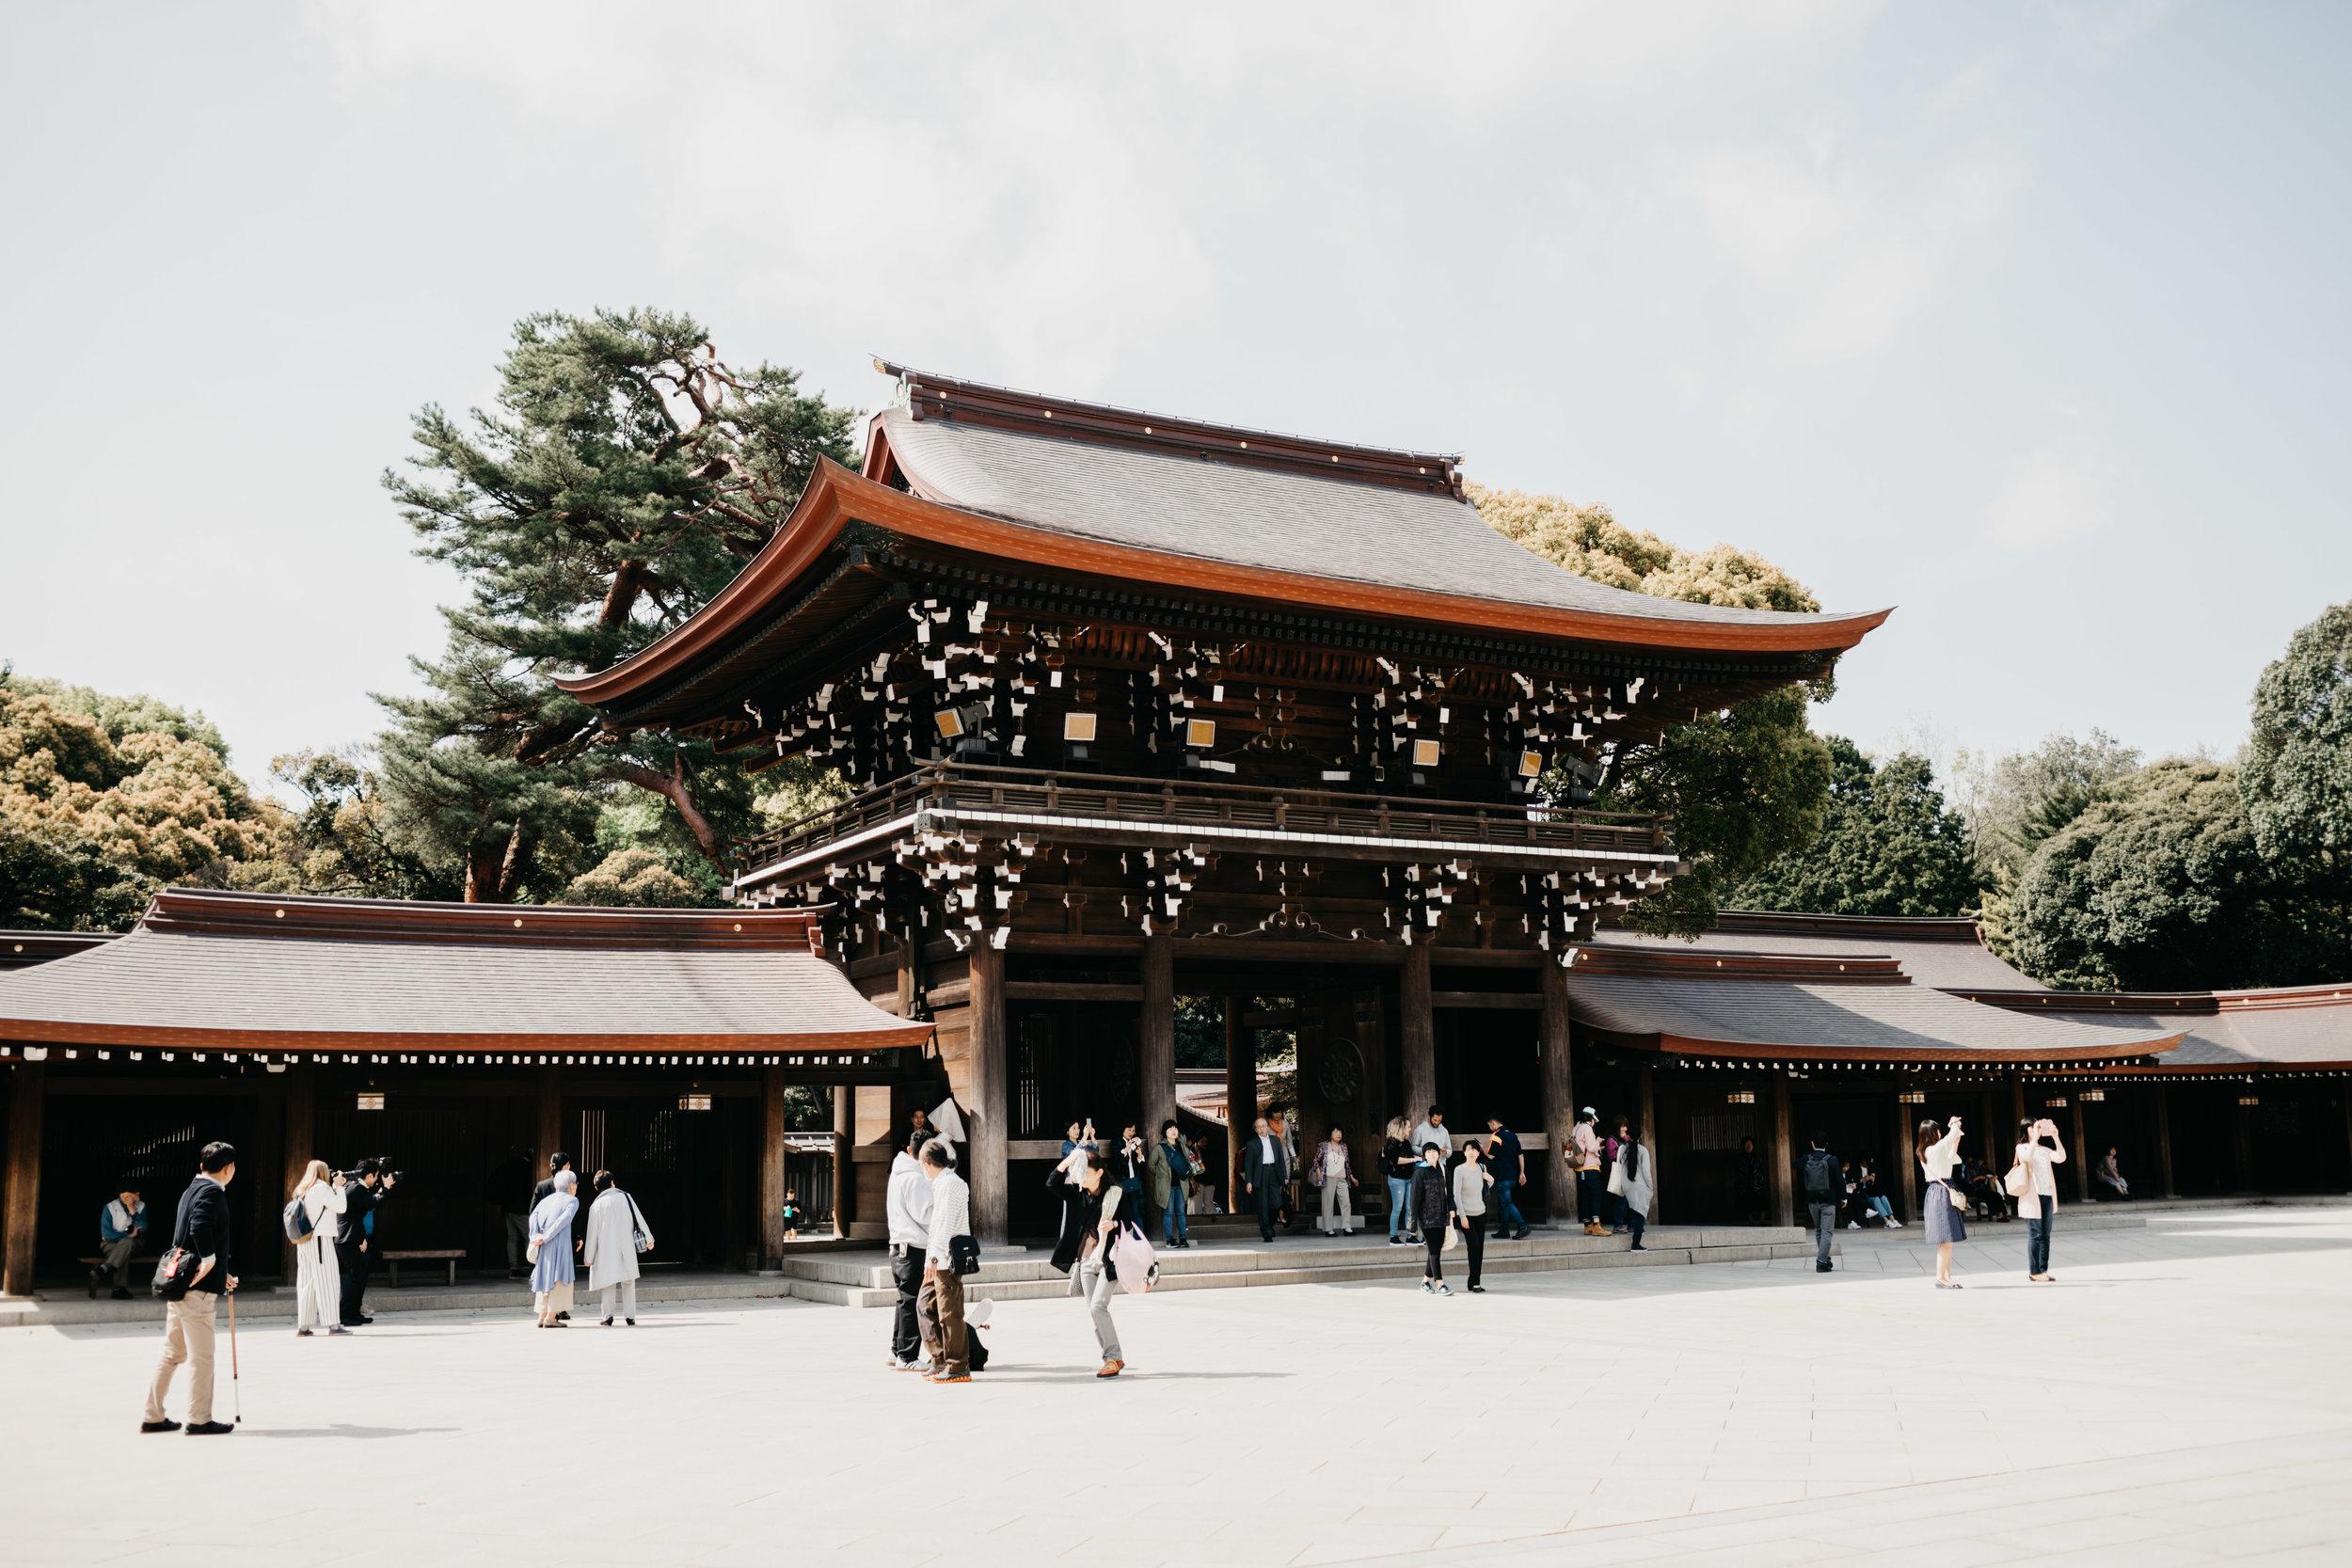 tokyo-meiji-temple-photo-by-samantha-look.jpg